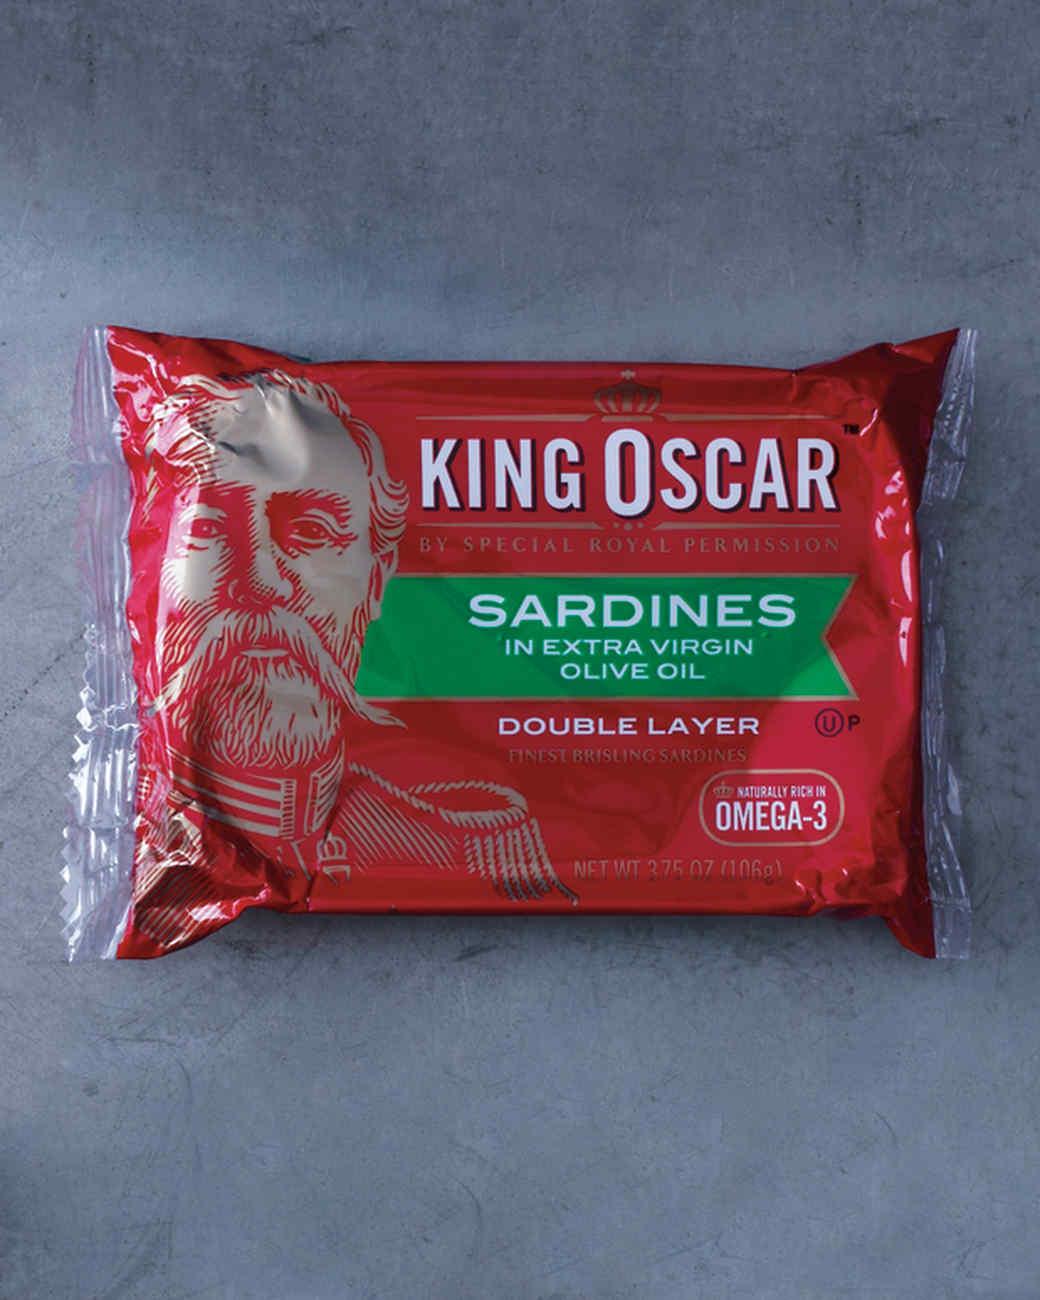 sardines-6-mld109192.jpg